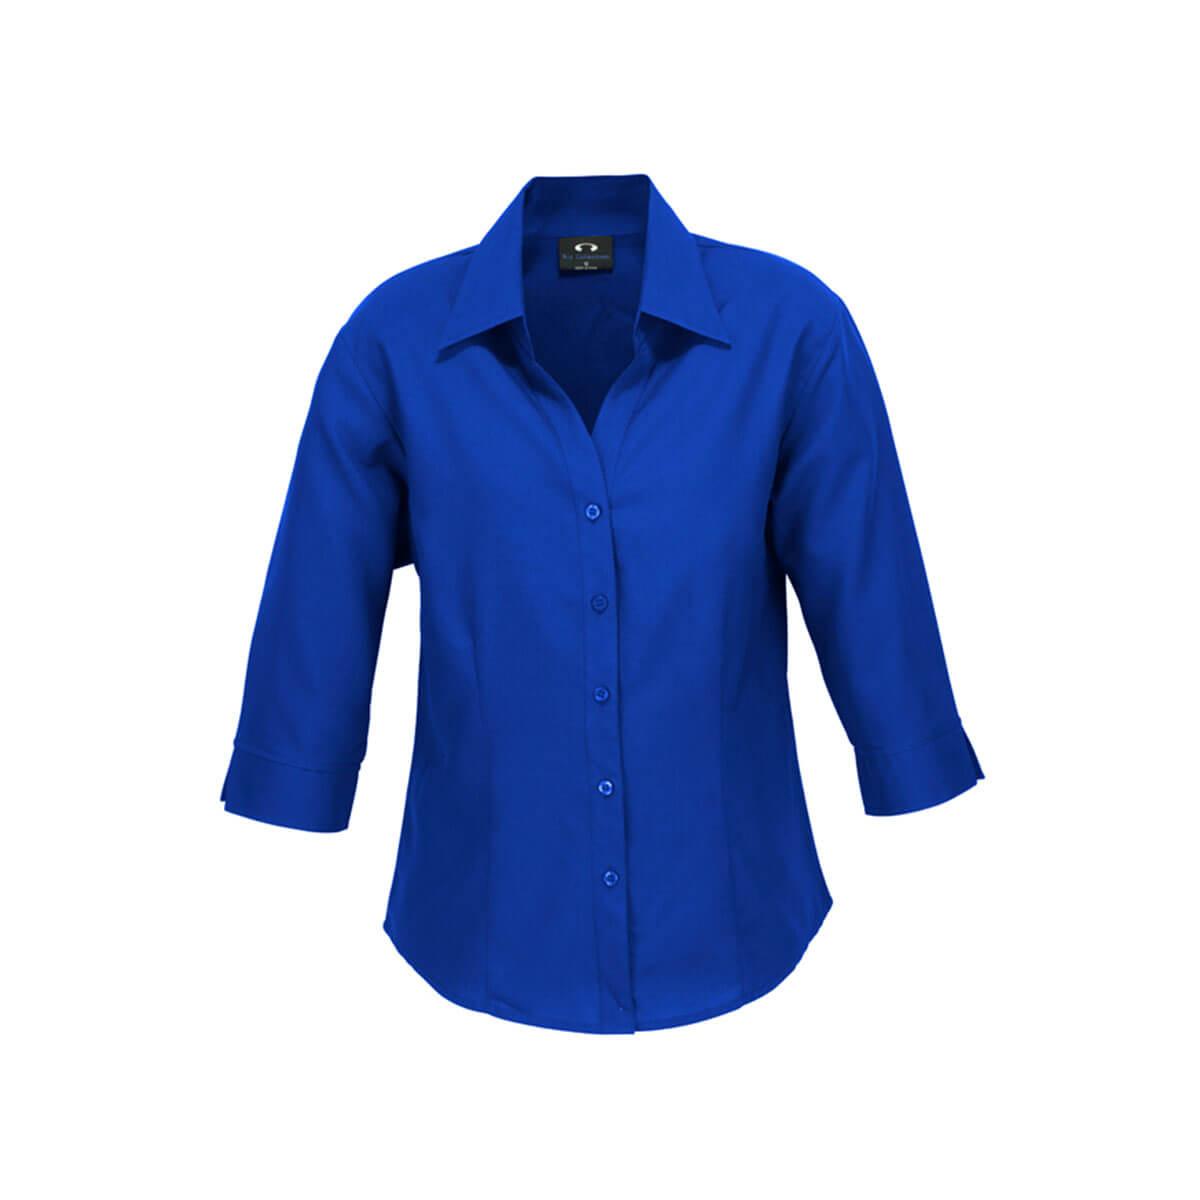 Ladies Plain Oasis 3/4 Sleeve Shirt-Electric Blue